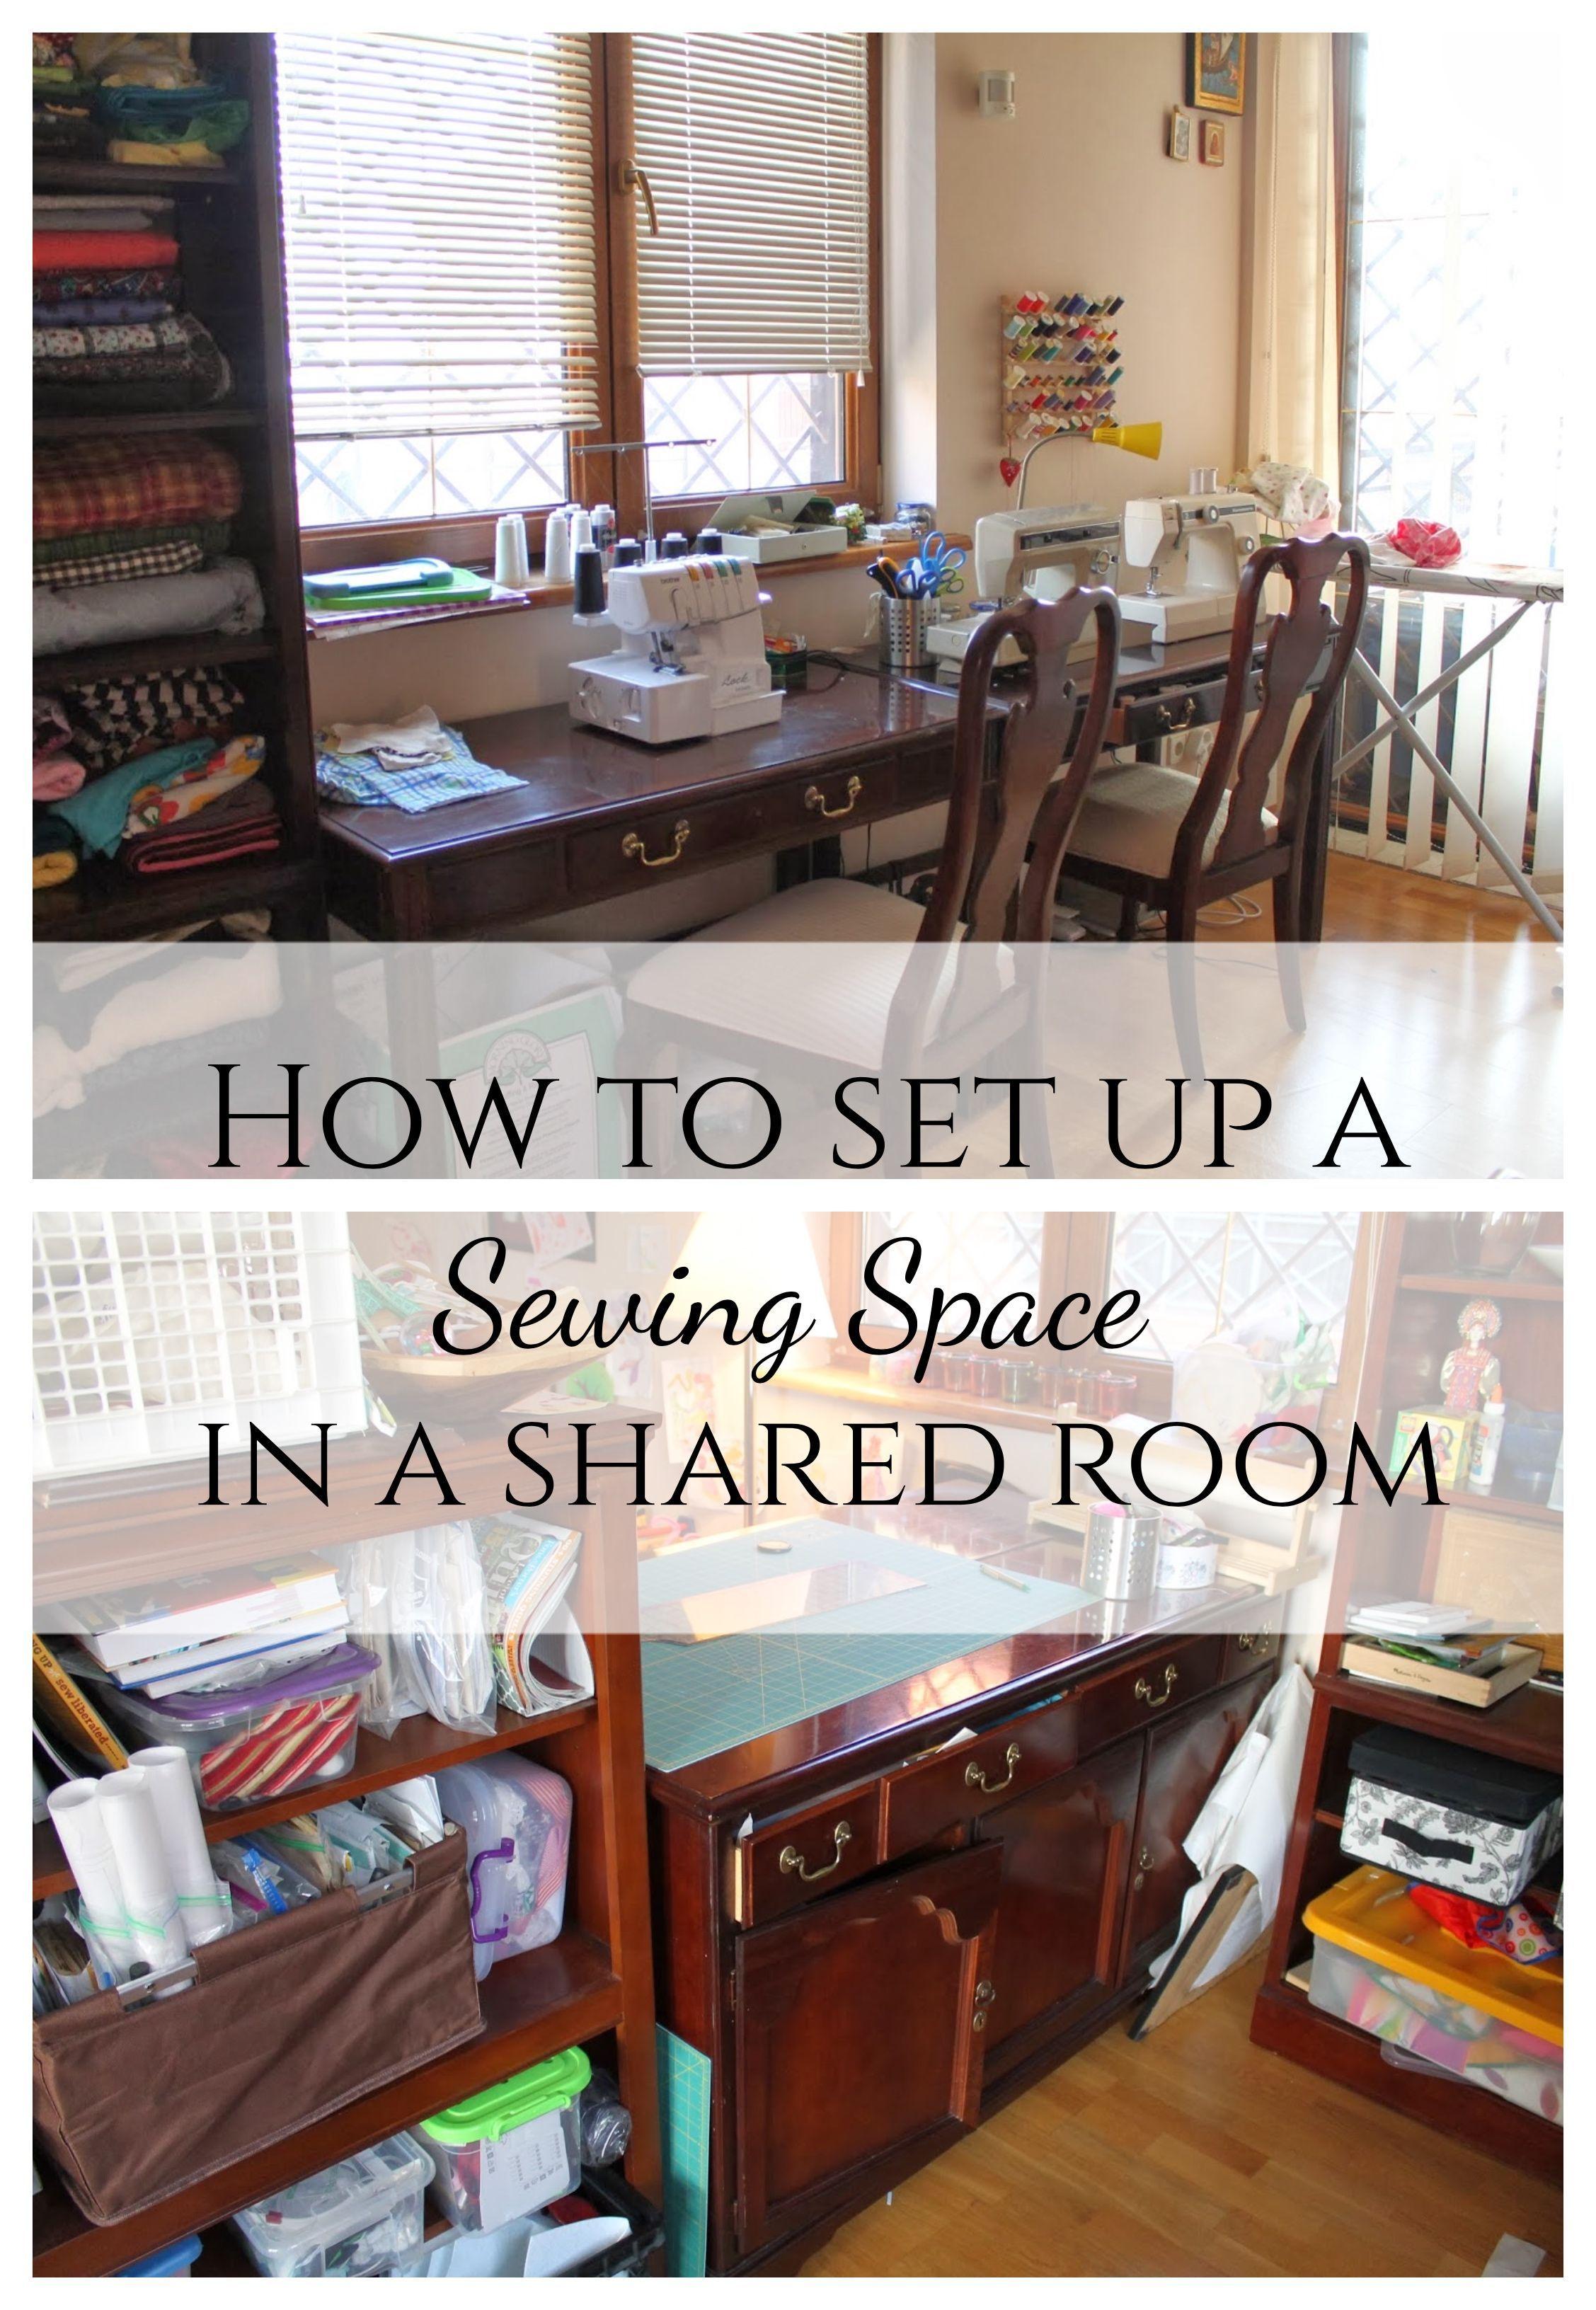 The Mobile Sewing Room Sewing Room Sewing Room Inspiration